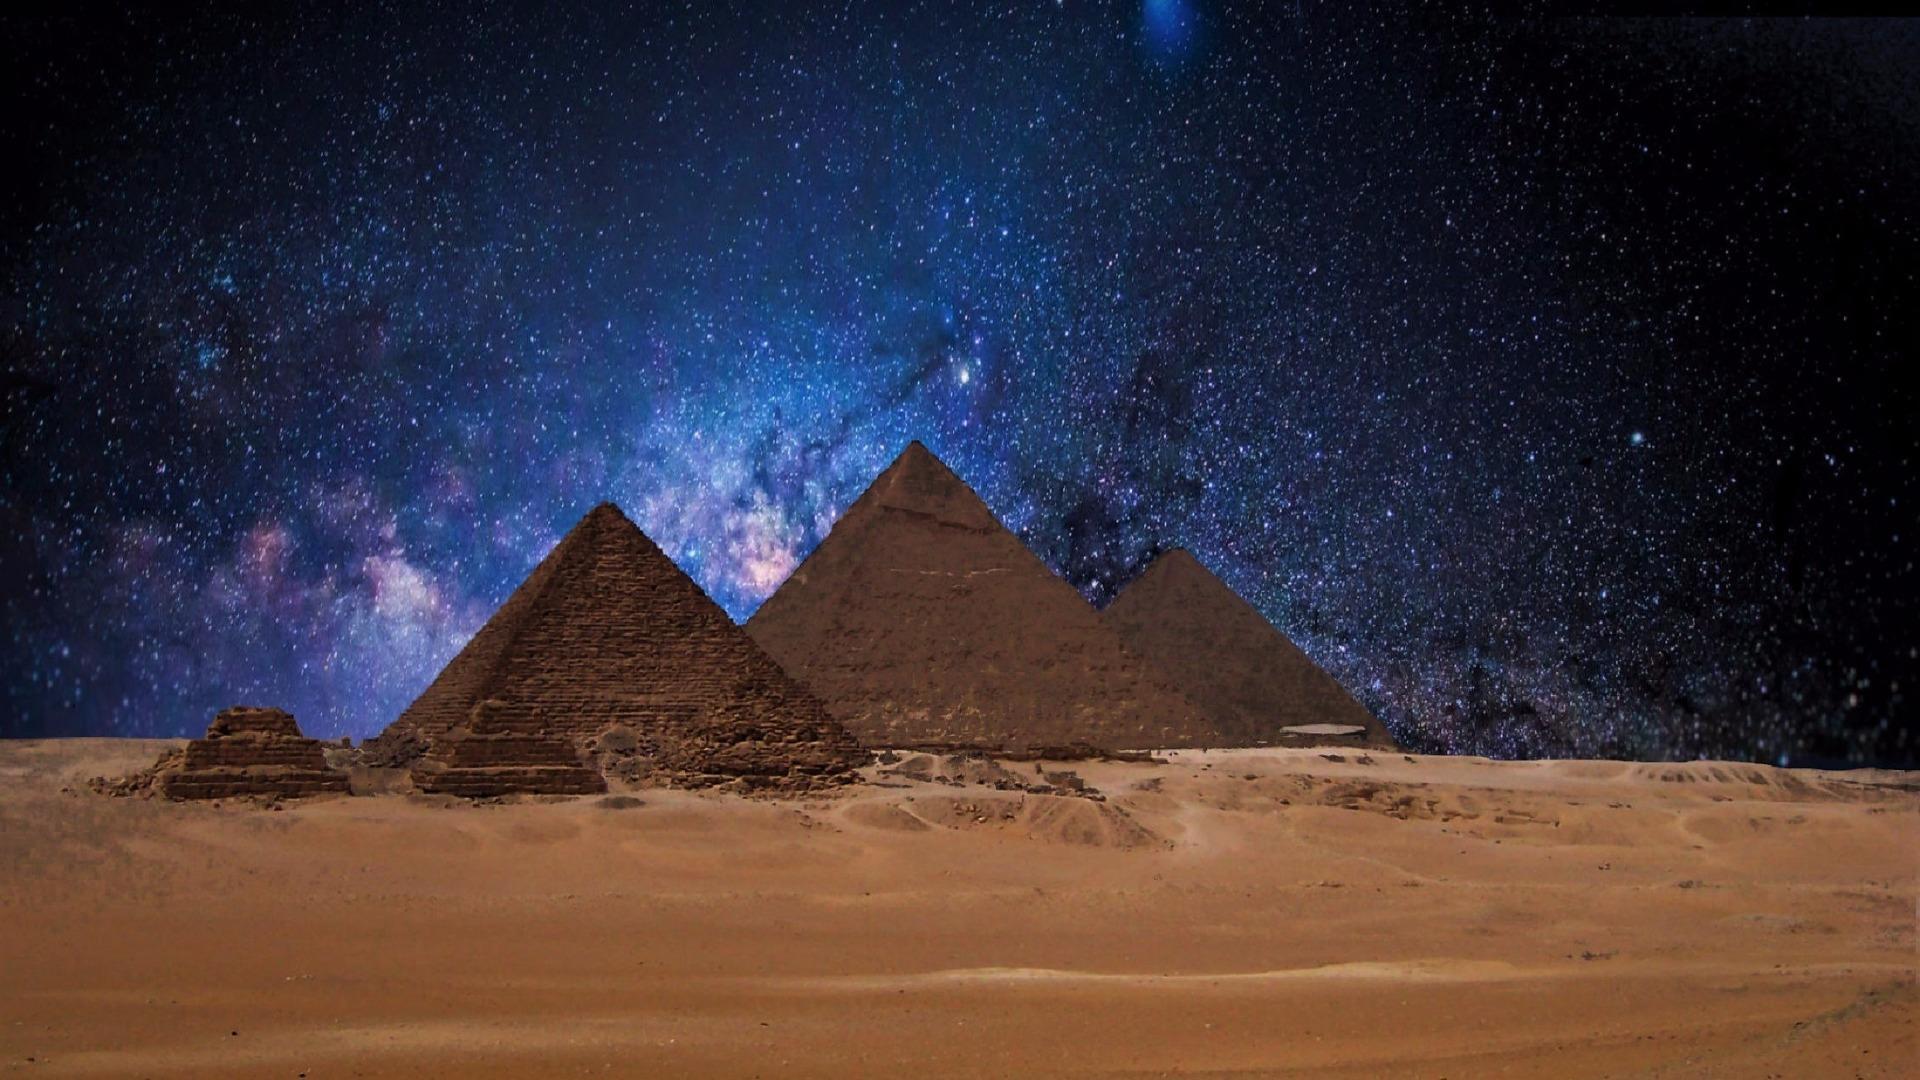 Egyptian Pyramids at night wallpaper